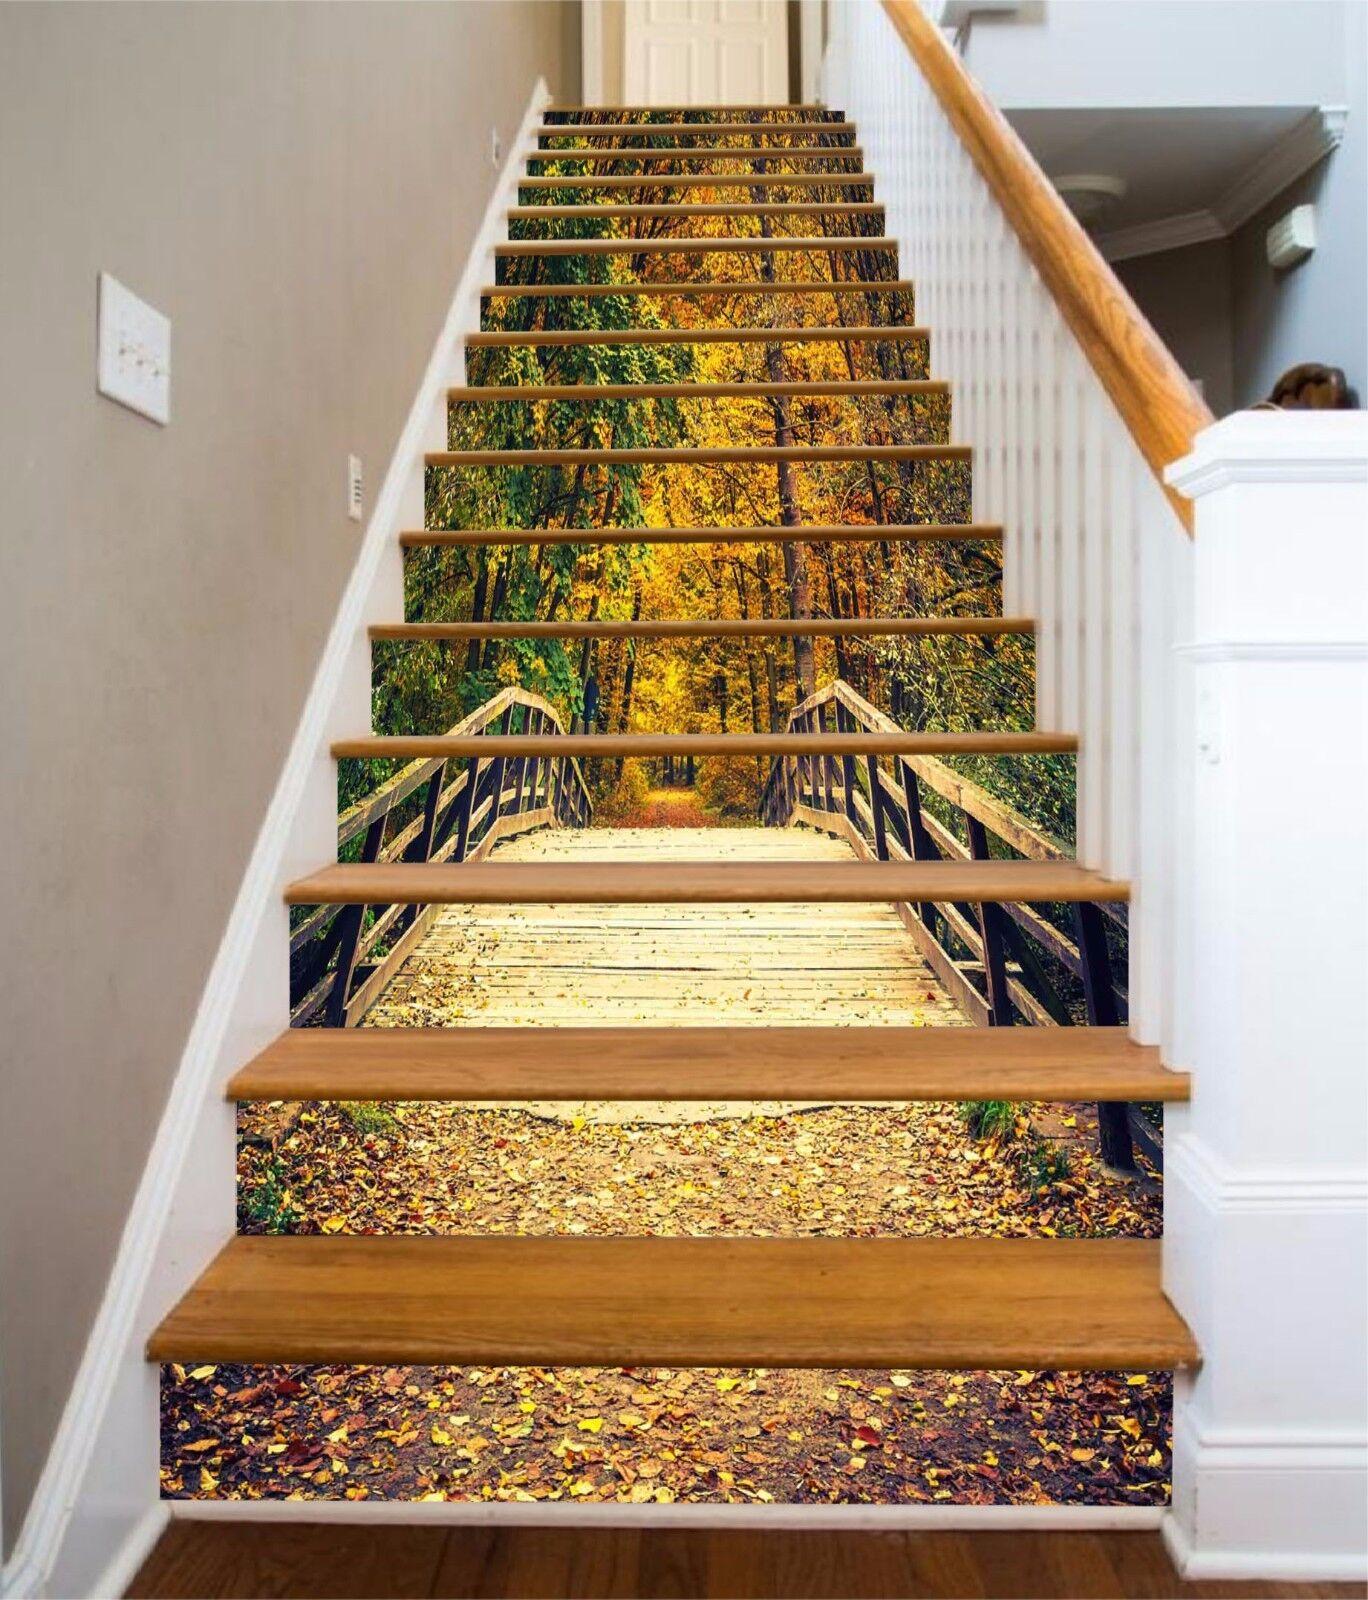 3D Tree Bridge 7845 Stair Risers Decoration Photo Mural Vinyl Decal Wallpaper AU